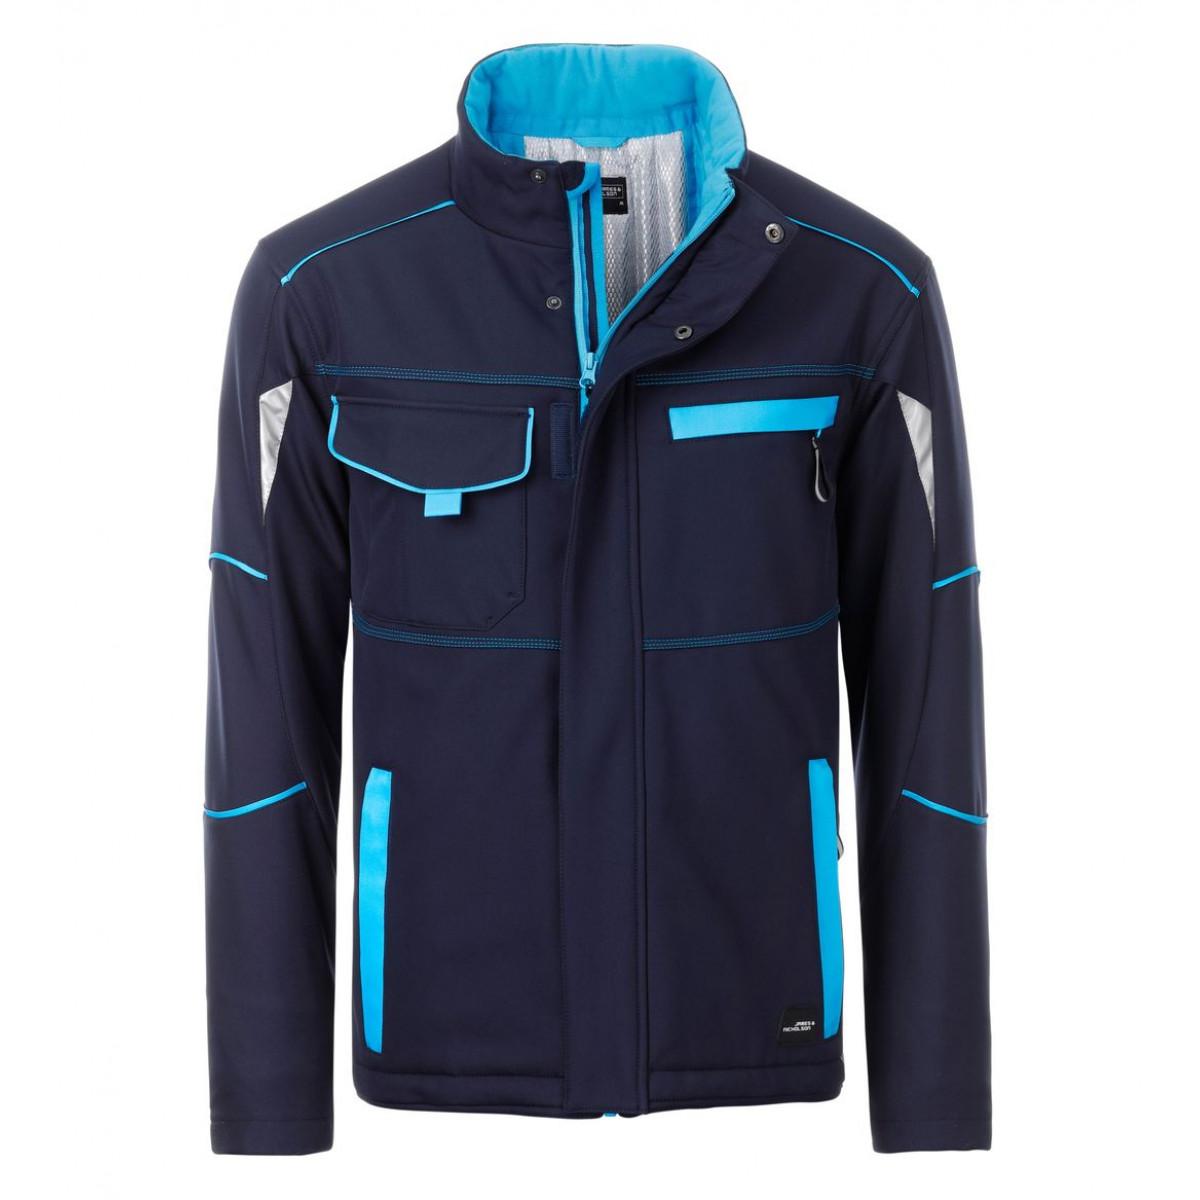 Куртка мужская JN853 Workwear Softshell Padded Jacket-Level 2 - Темно-синий/Бирюзовый